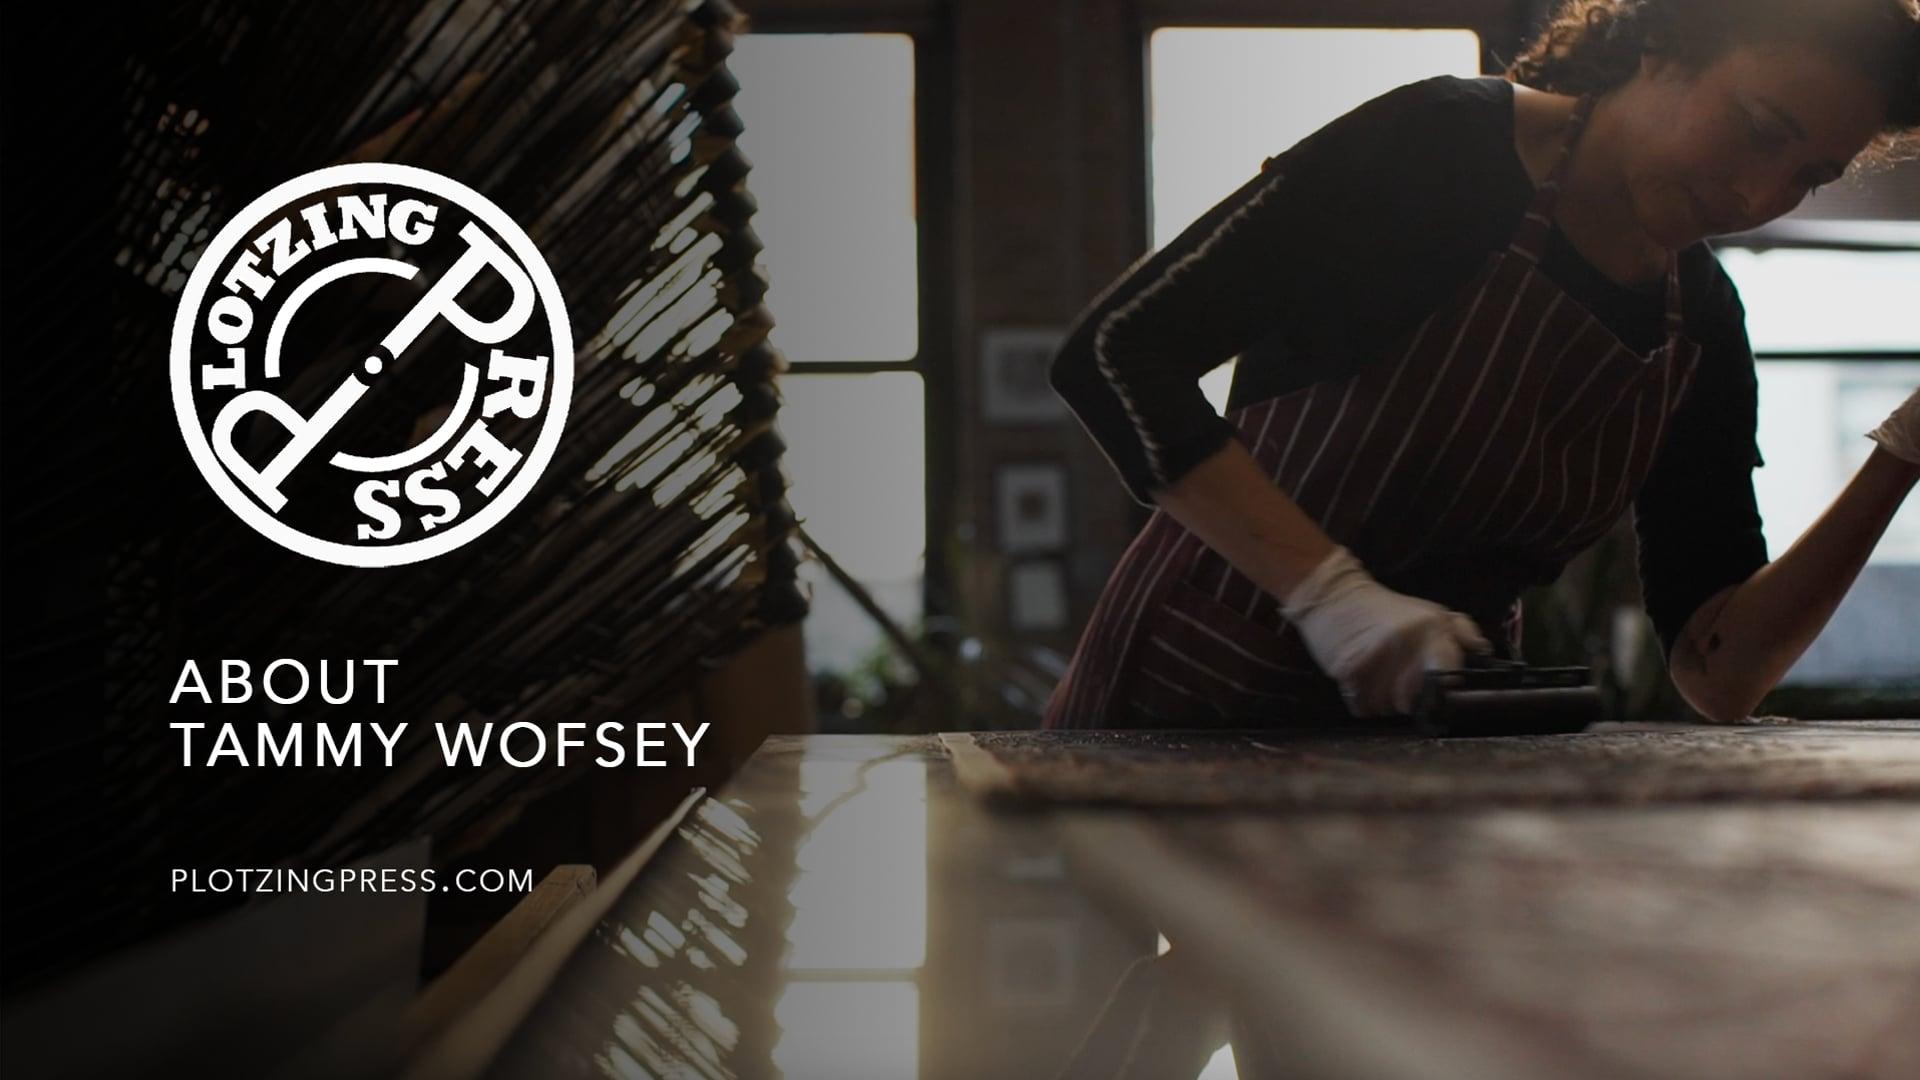 Tammy Wofsey - Artist, Plotzing Press